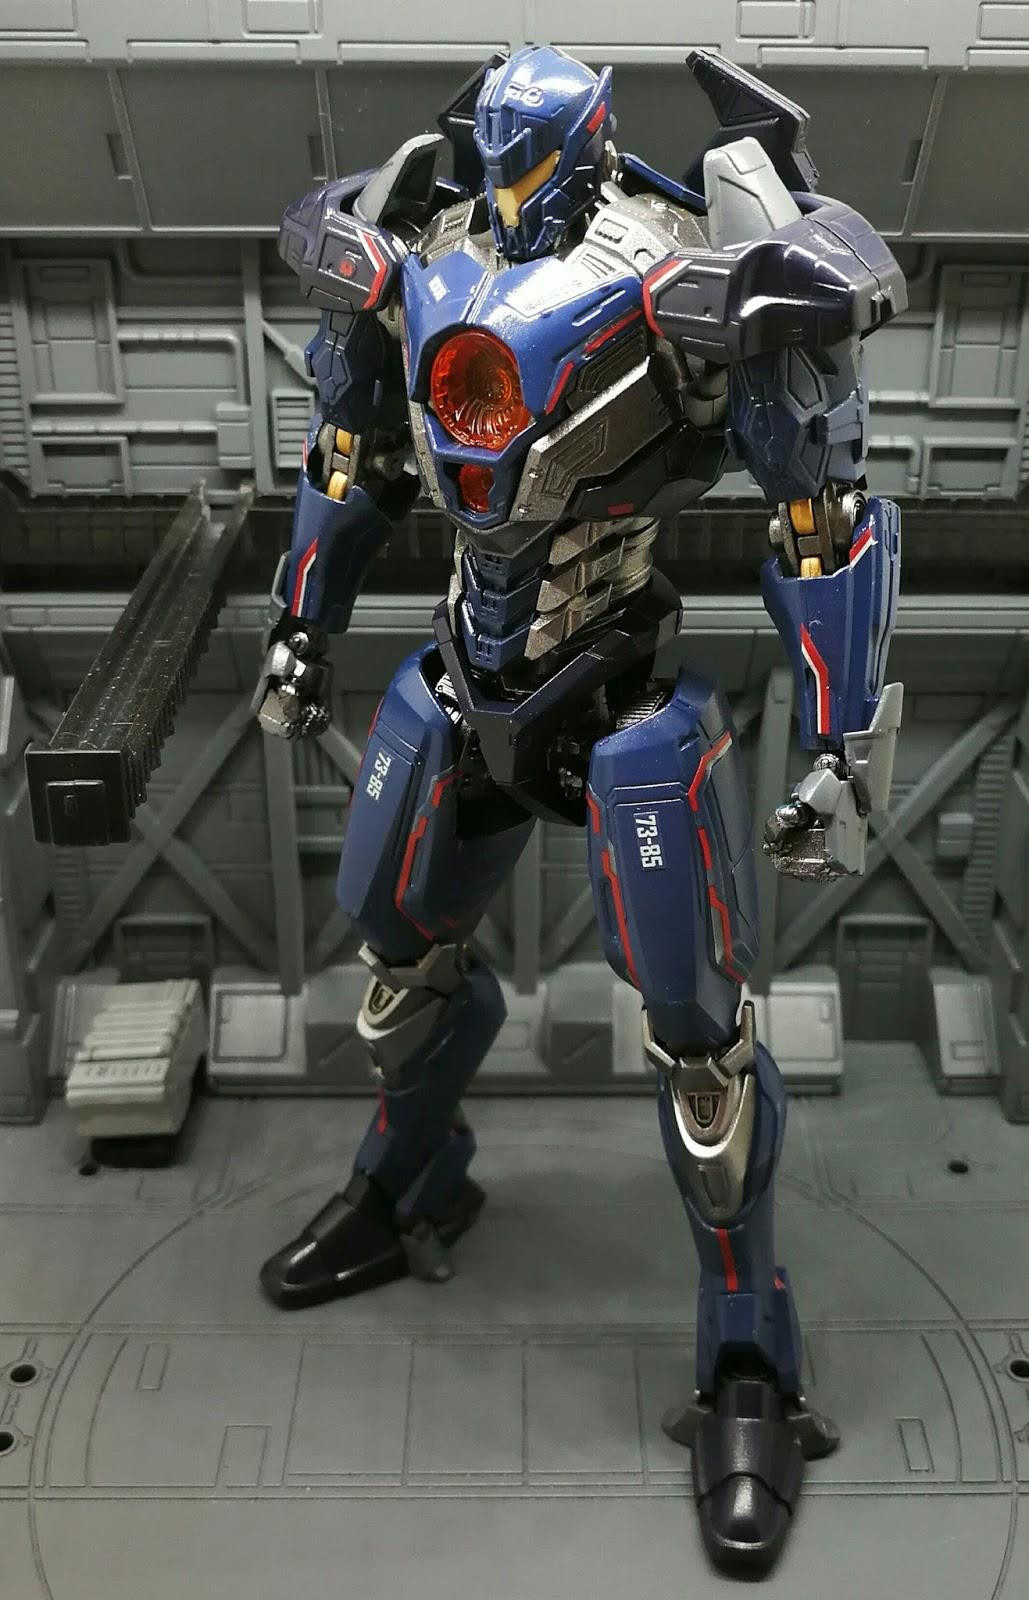 PACIFIC RIM 2 Uprising HG 004 Gipsy Avengers Final Battle BANDAI MODEL KIT NEW